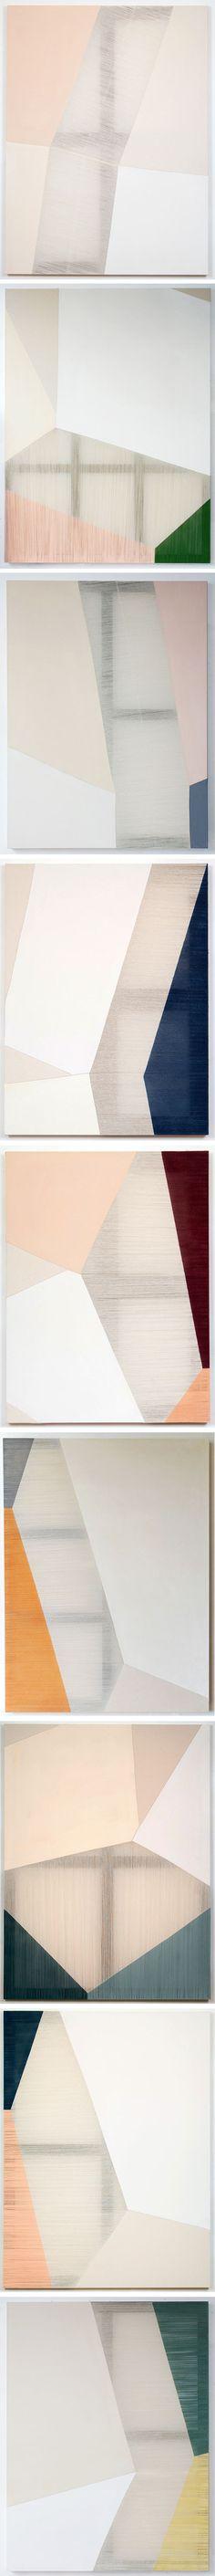 The work of Rebecca Ward   http://blog.littlepaperplanes.com/rebecca-ward/